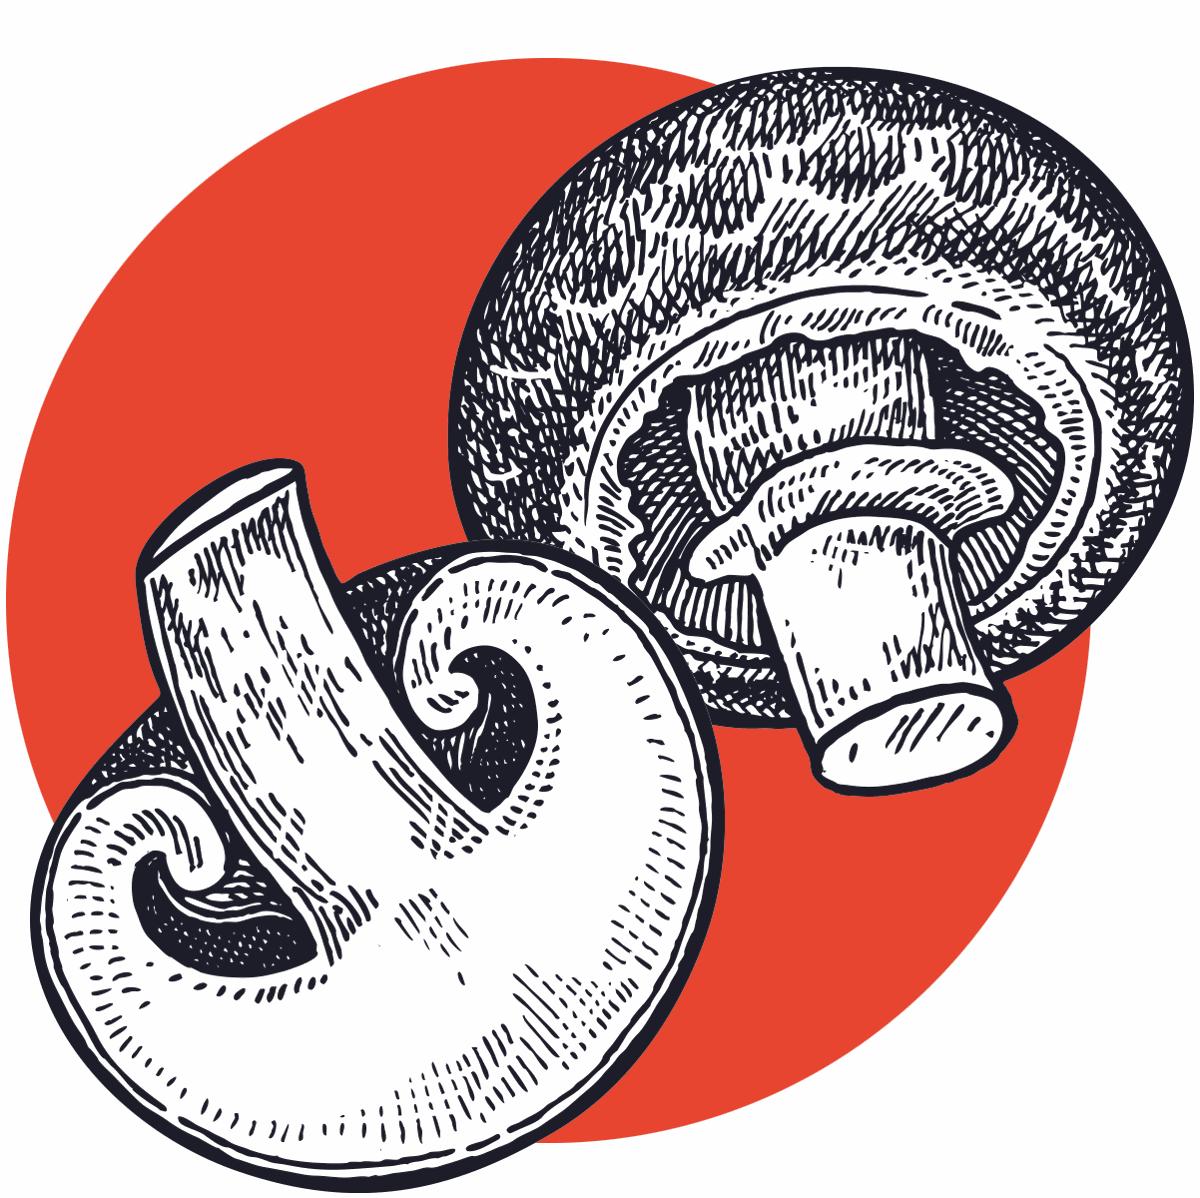 Cremini mushroom